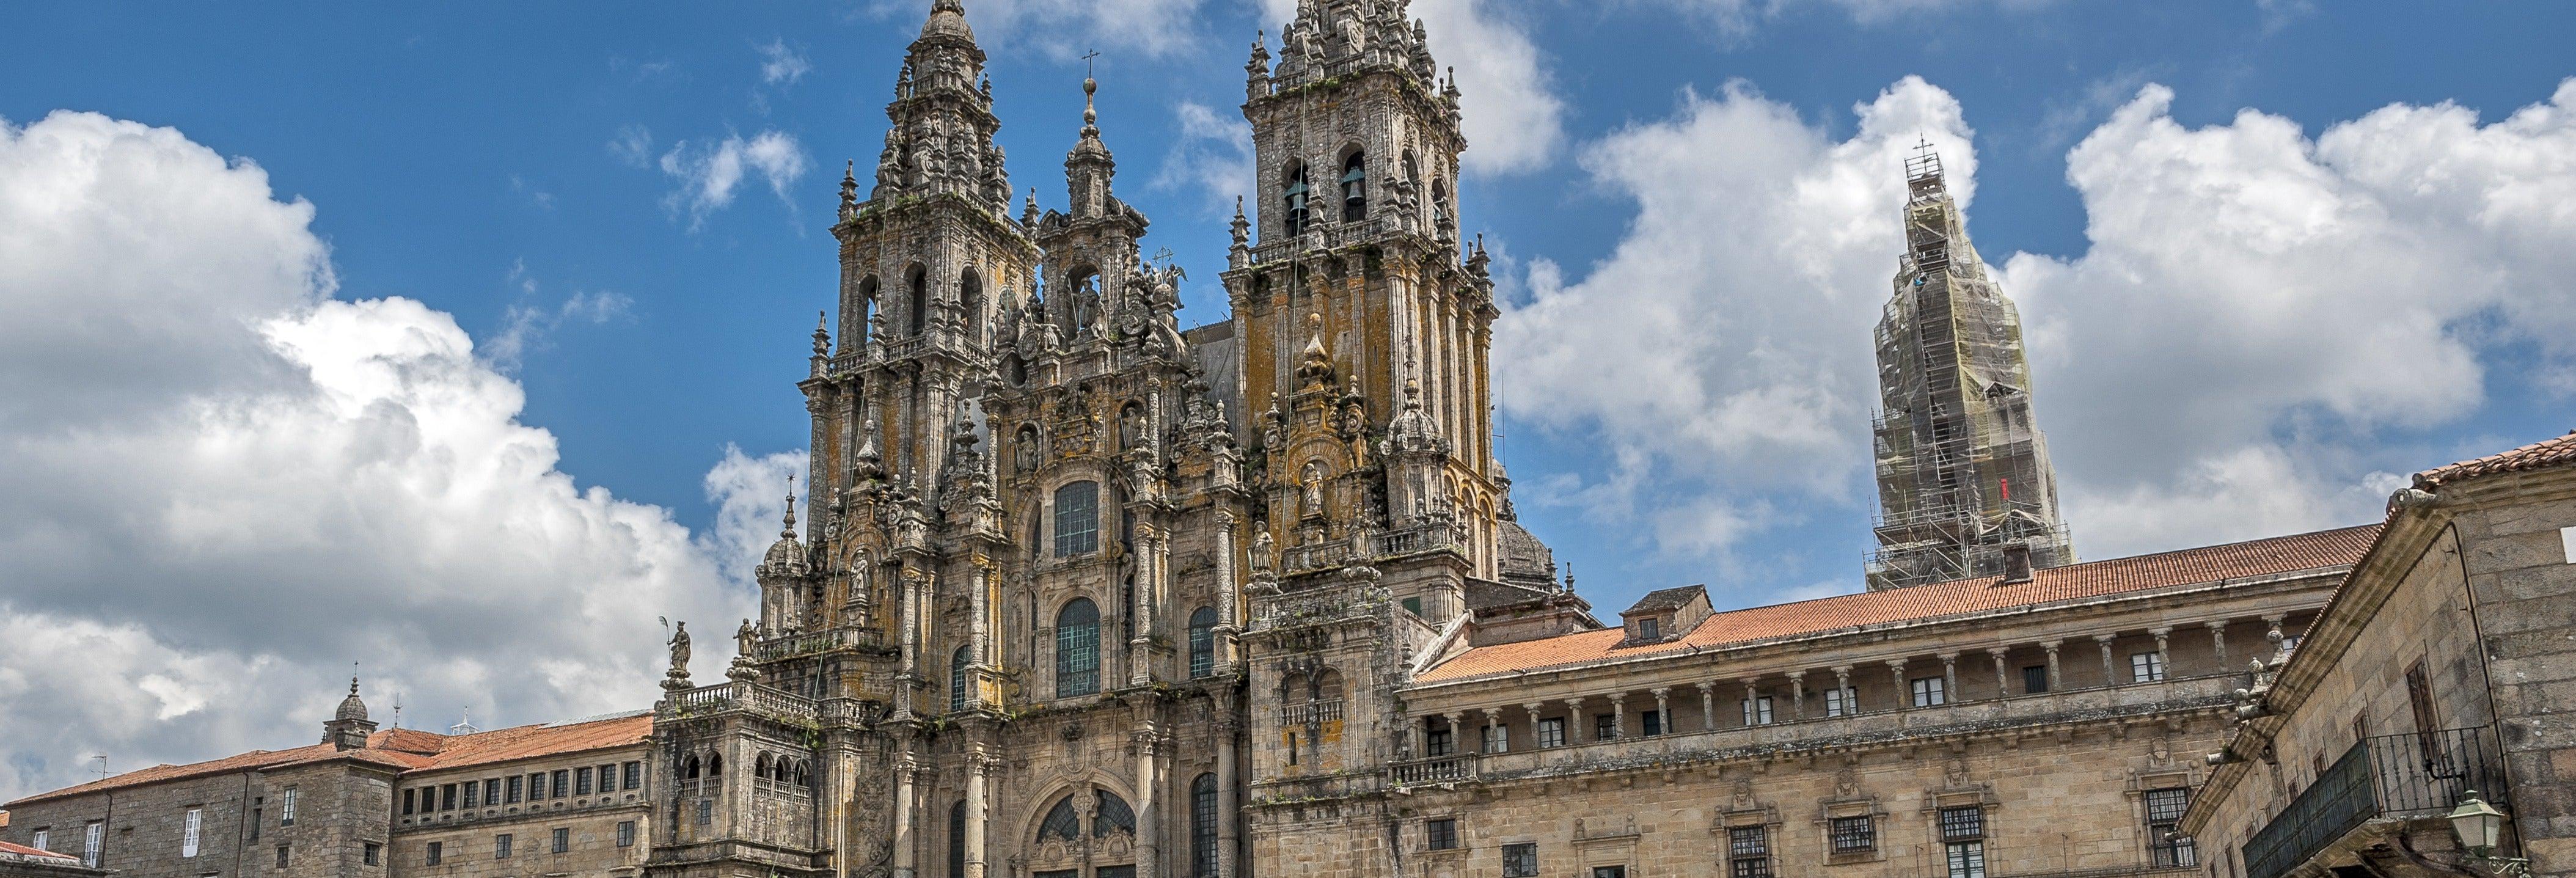 Day Trip to Santiago de Compostela